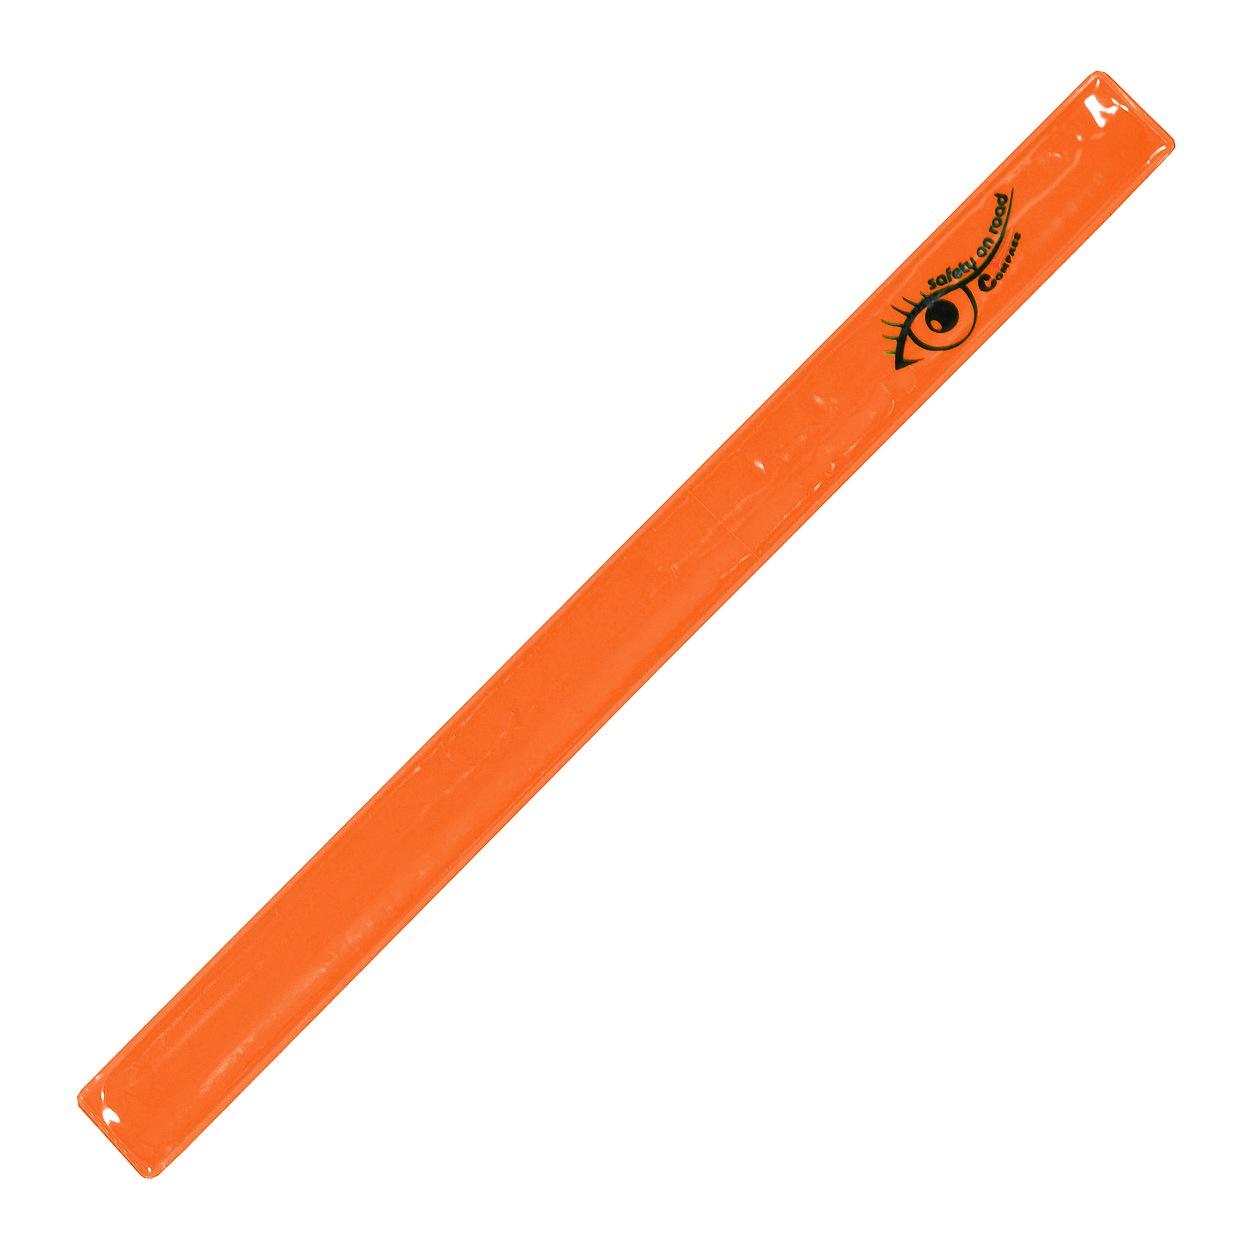 Pásek reflexní ROLLER XL 3x38cm S.O.R. oranžový